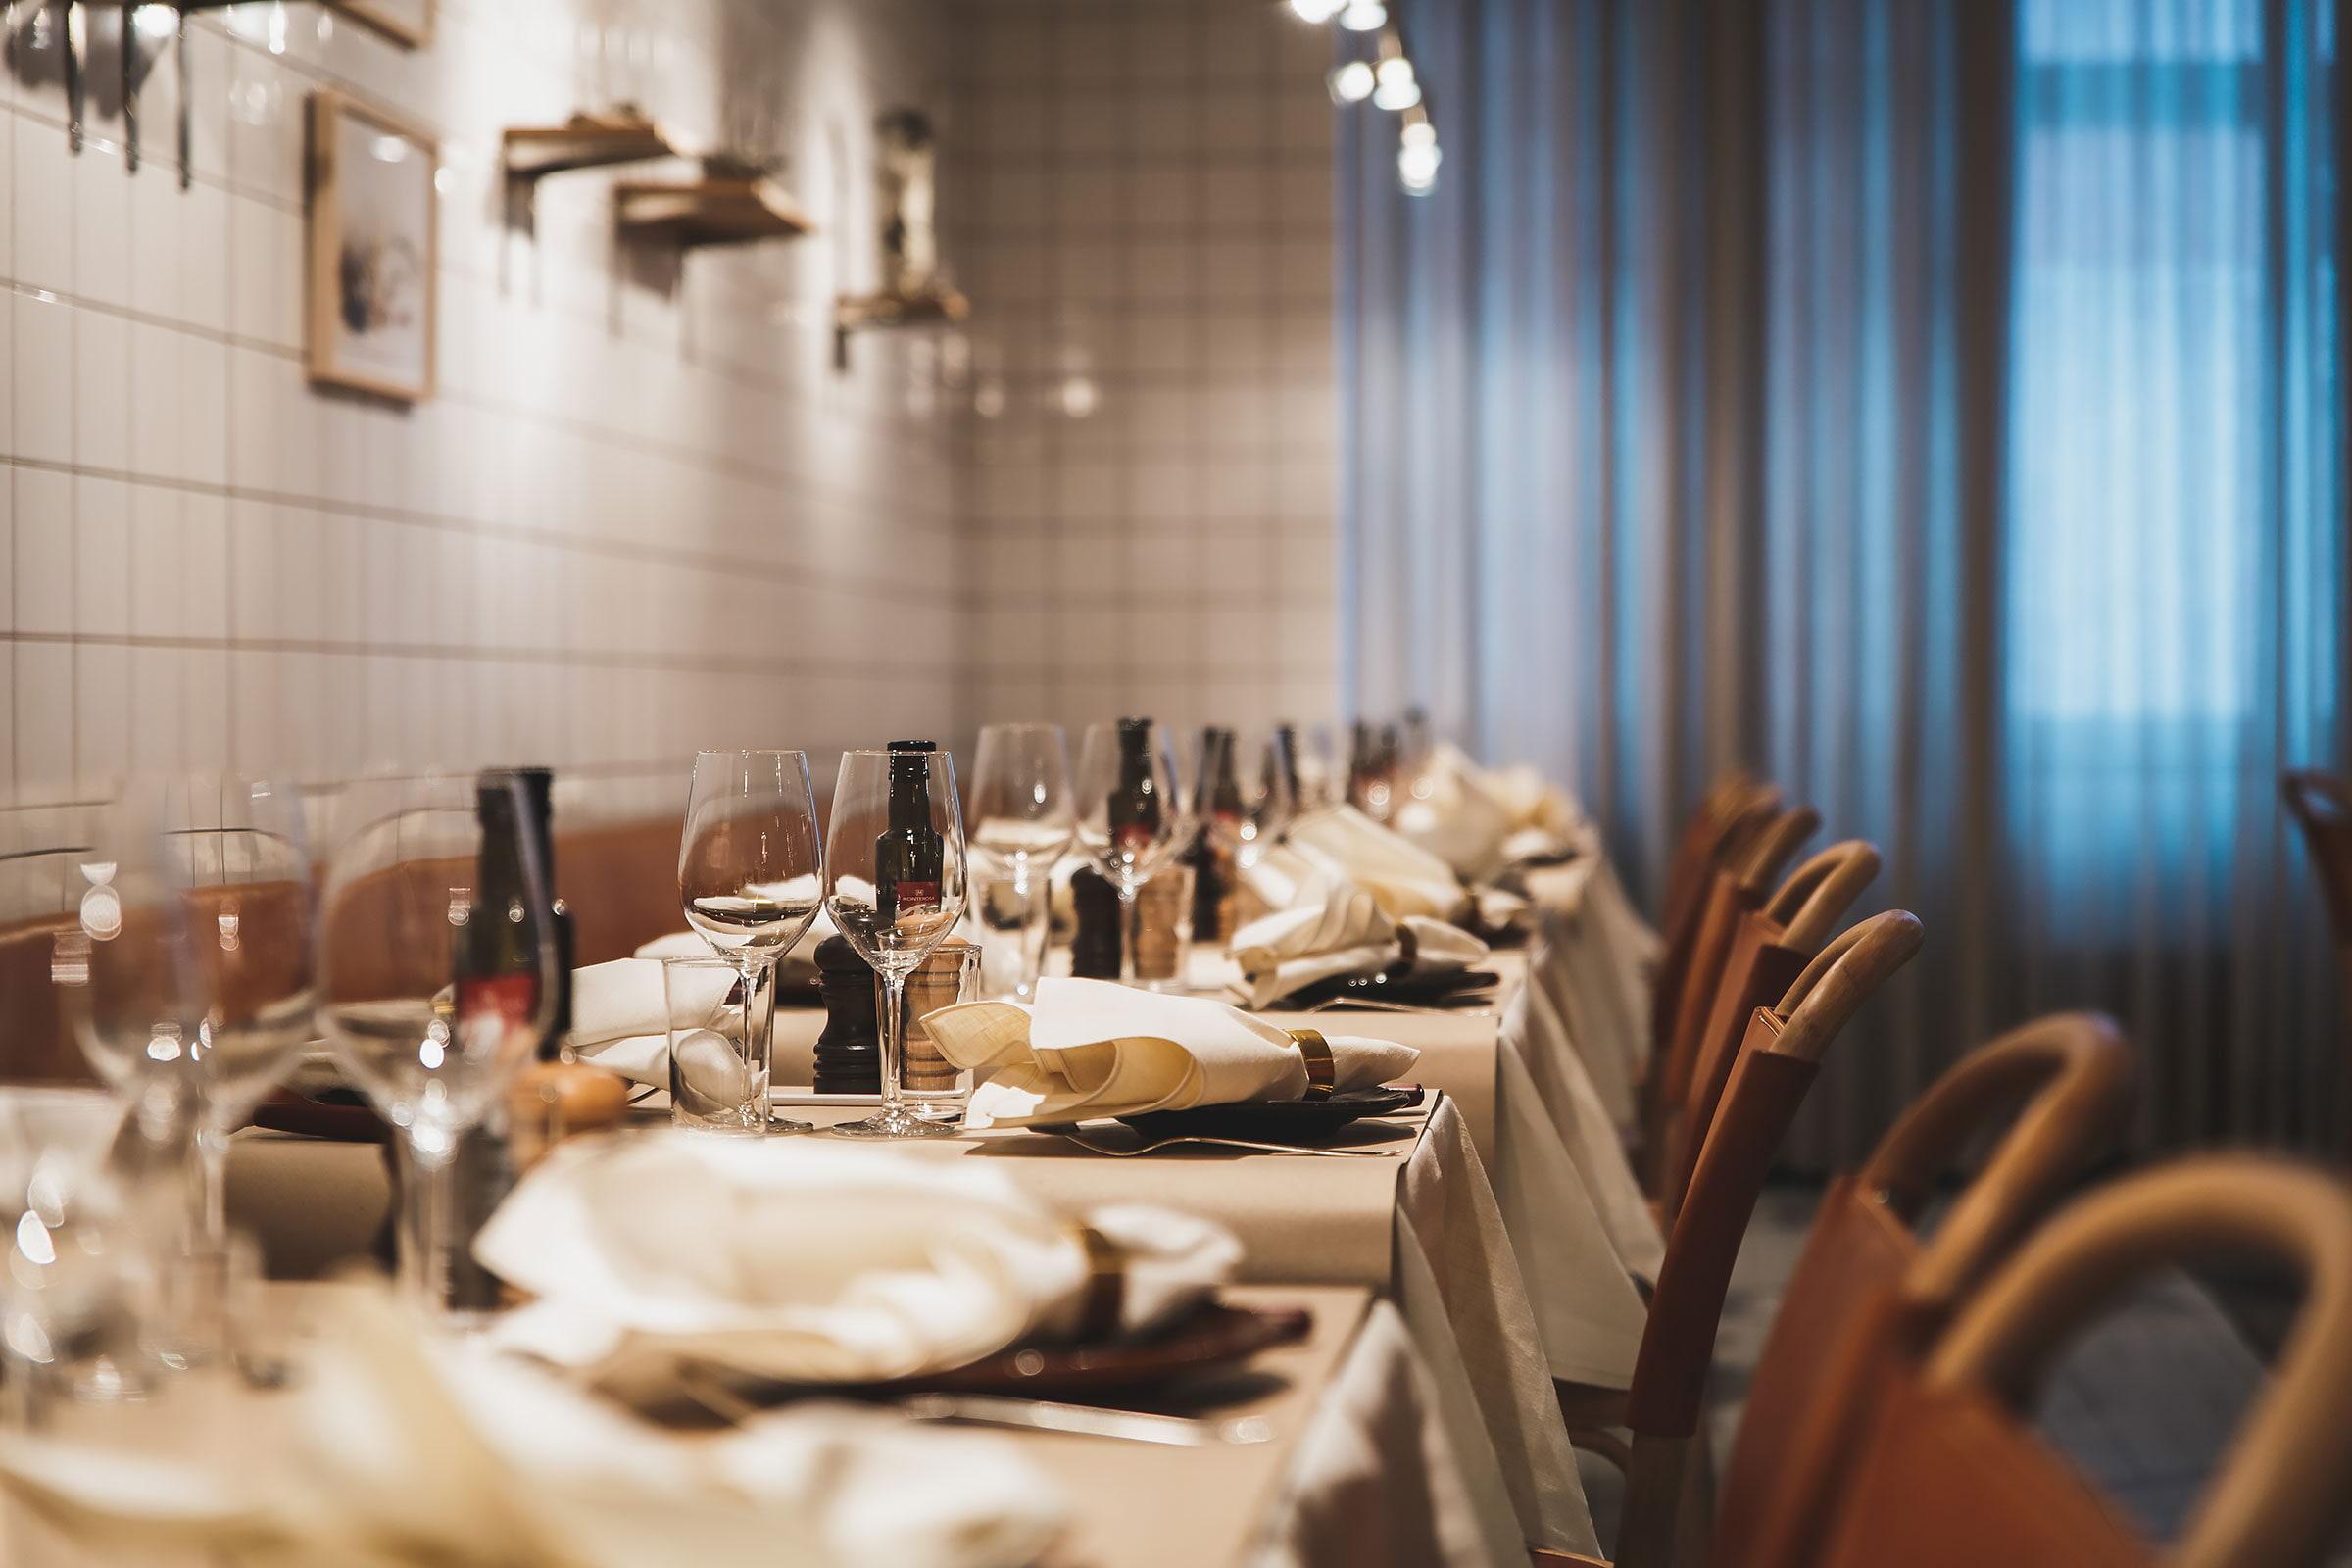 födelsedag restaurang stockholm